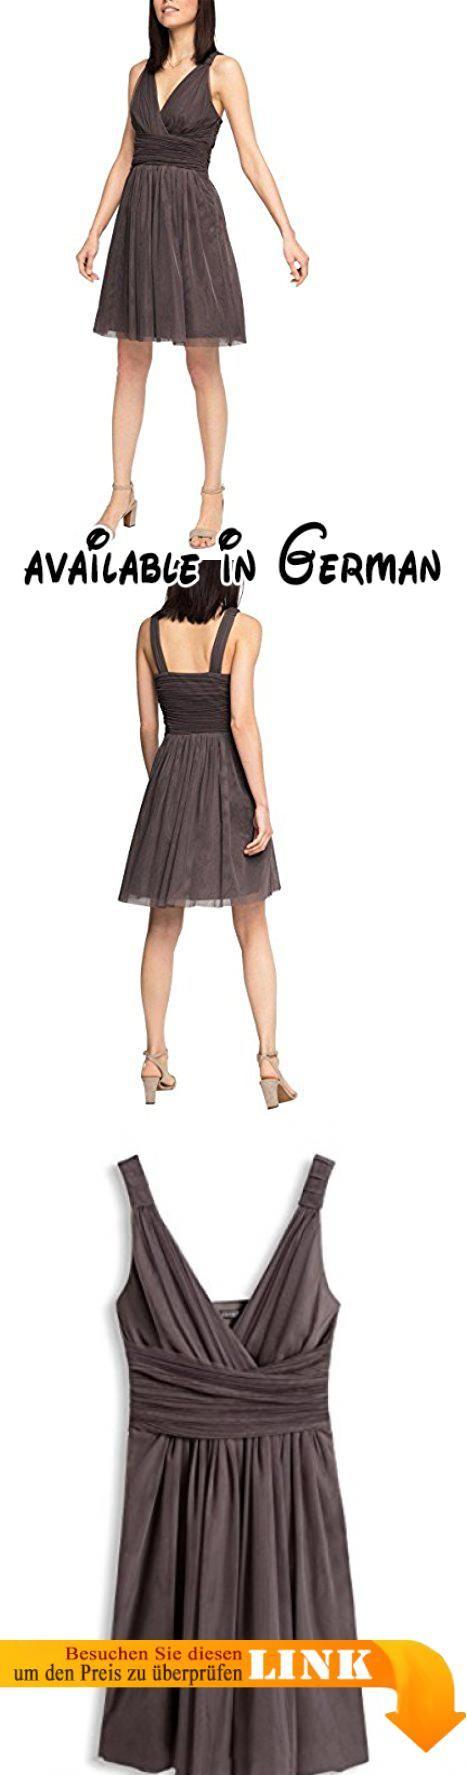 ESPRIT Collection Damen Kleid 066EO1E021-Wickeloptik, Braun (Taupe 240), 34. 74cbbbe8ae